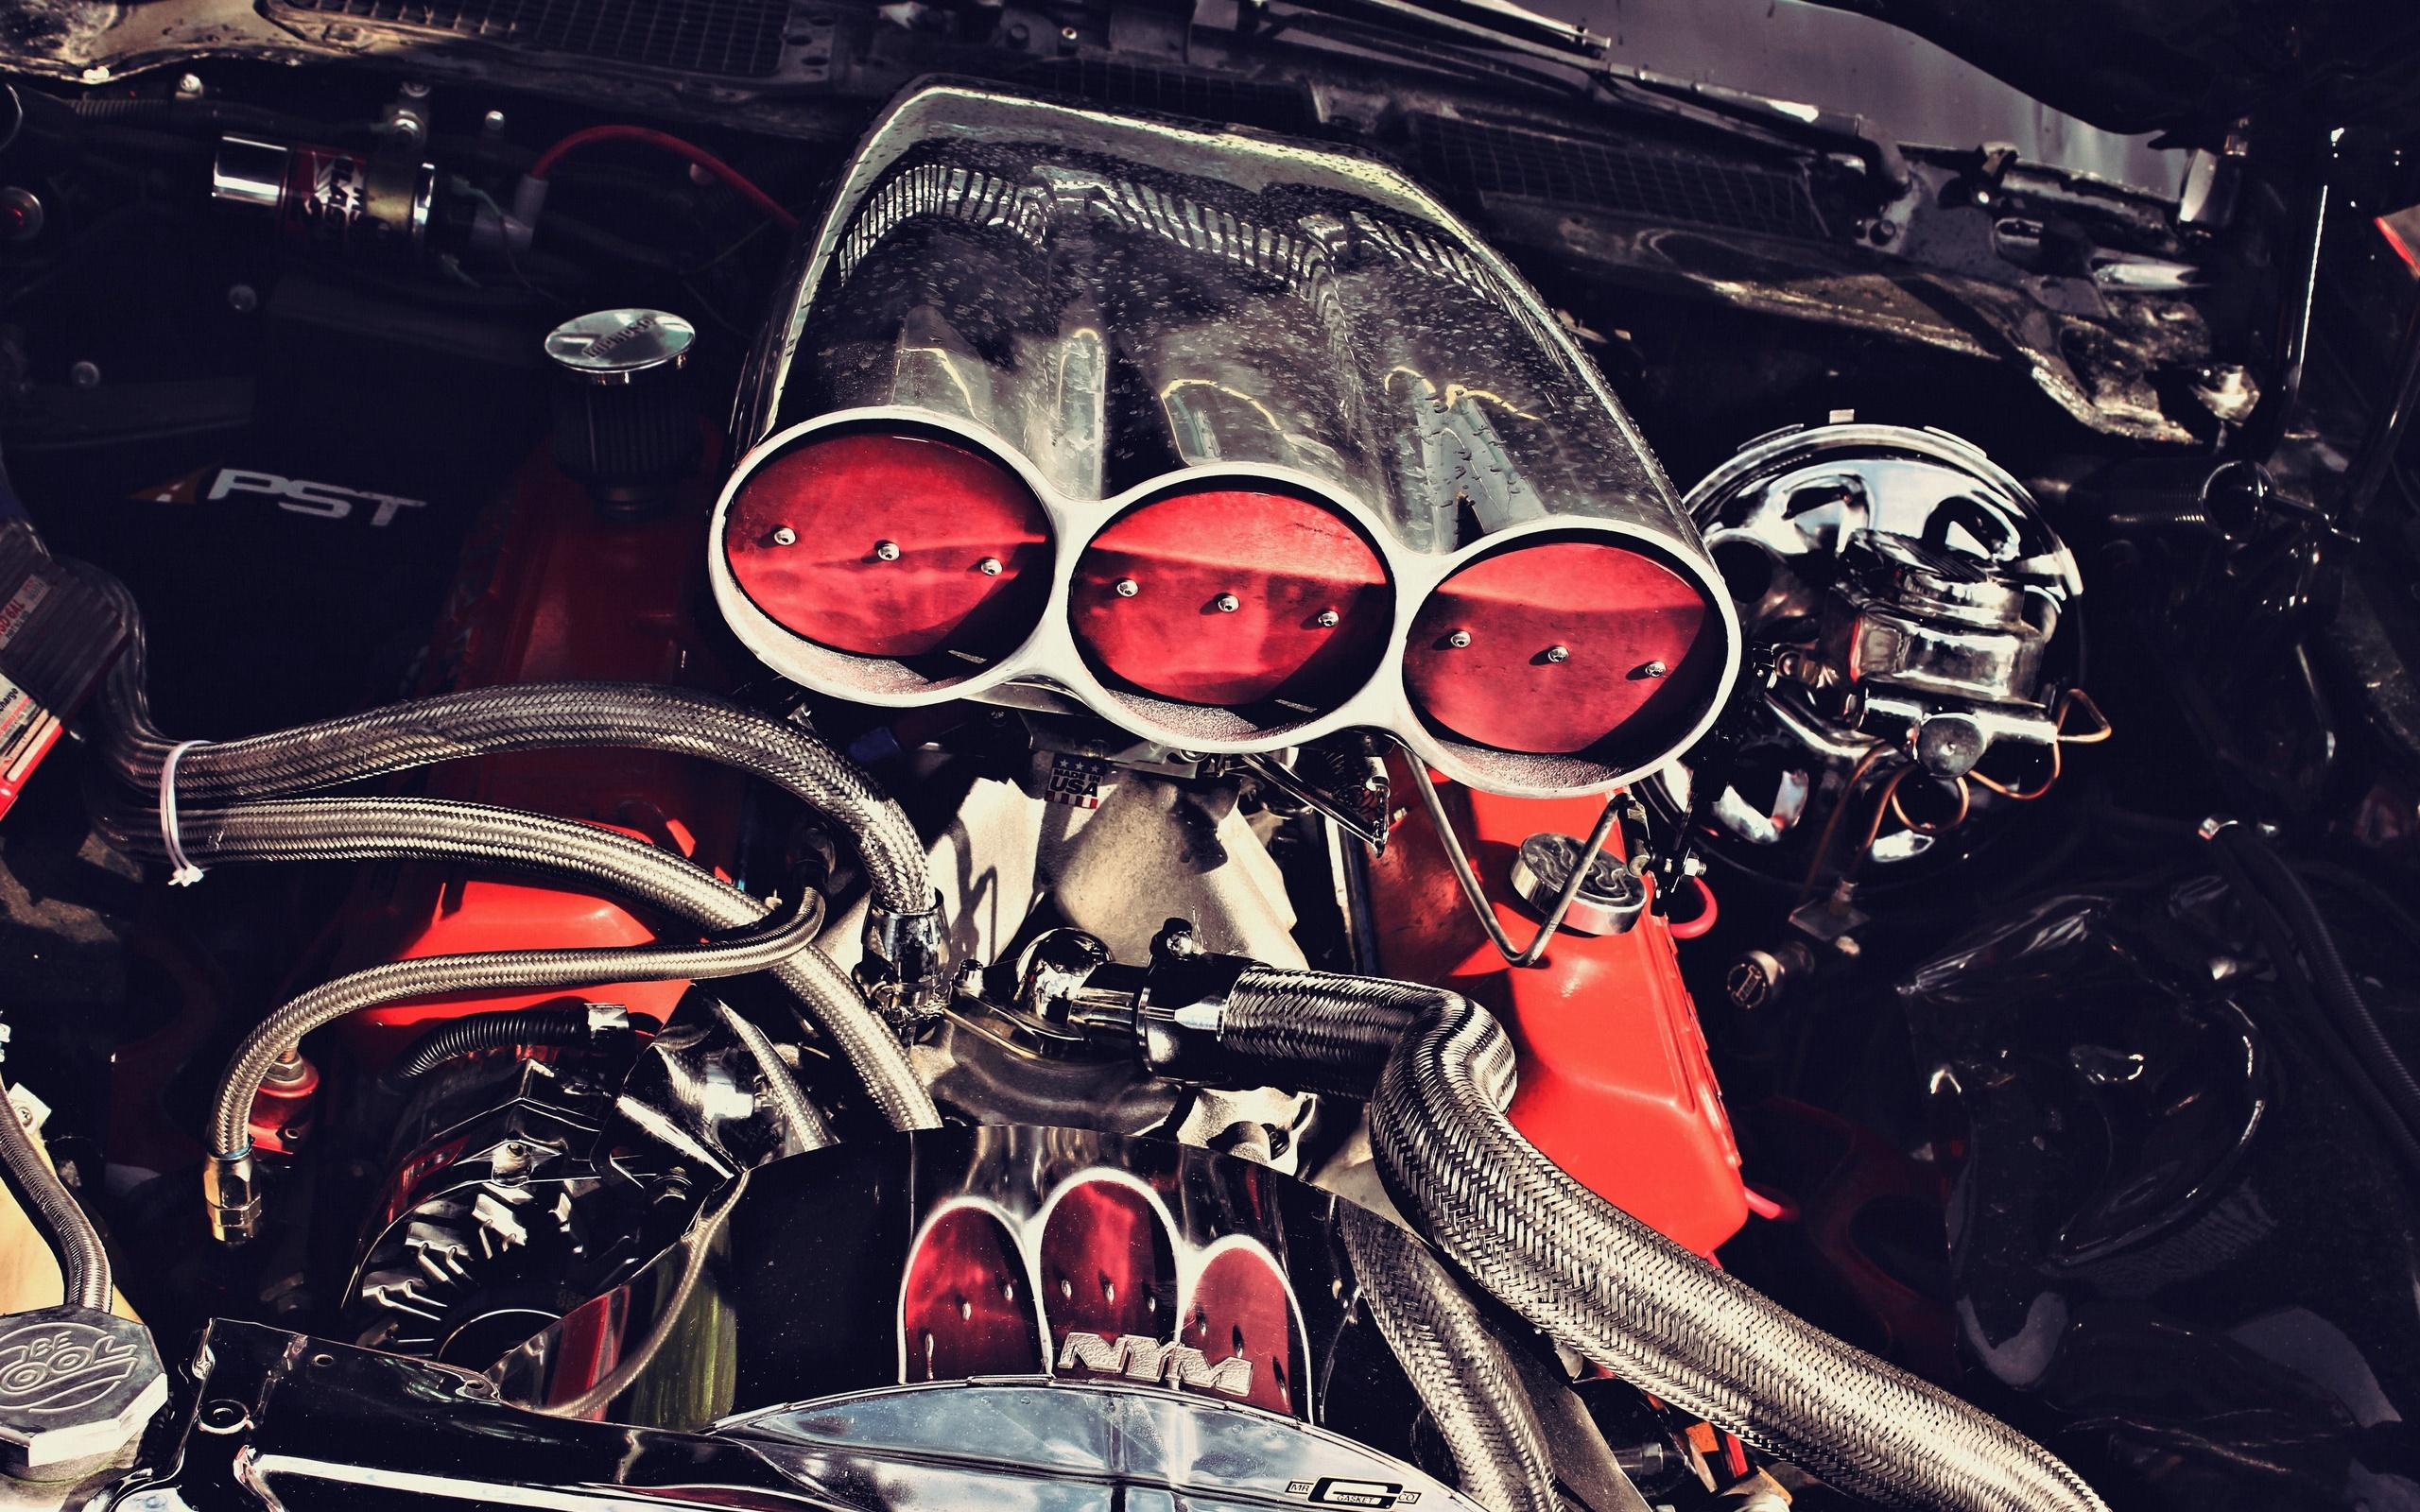 Engine Wallpaper; Engine Wallpaper; Engine Wallpaper ...